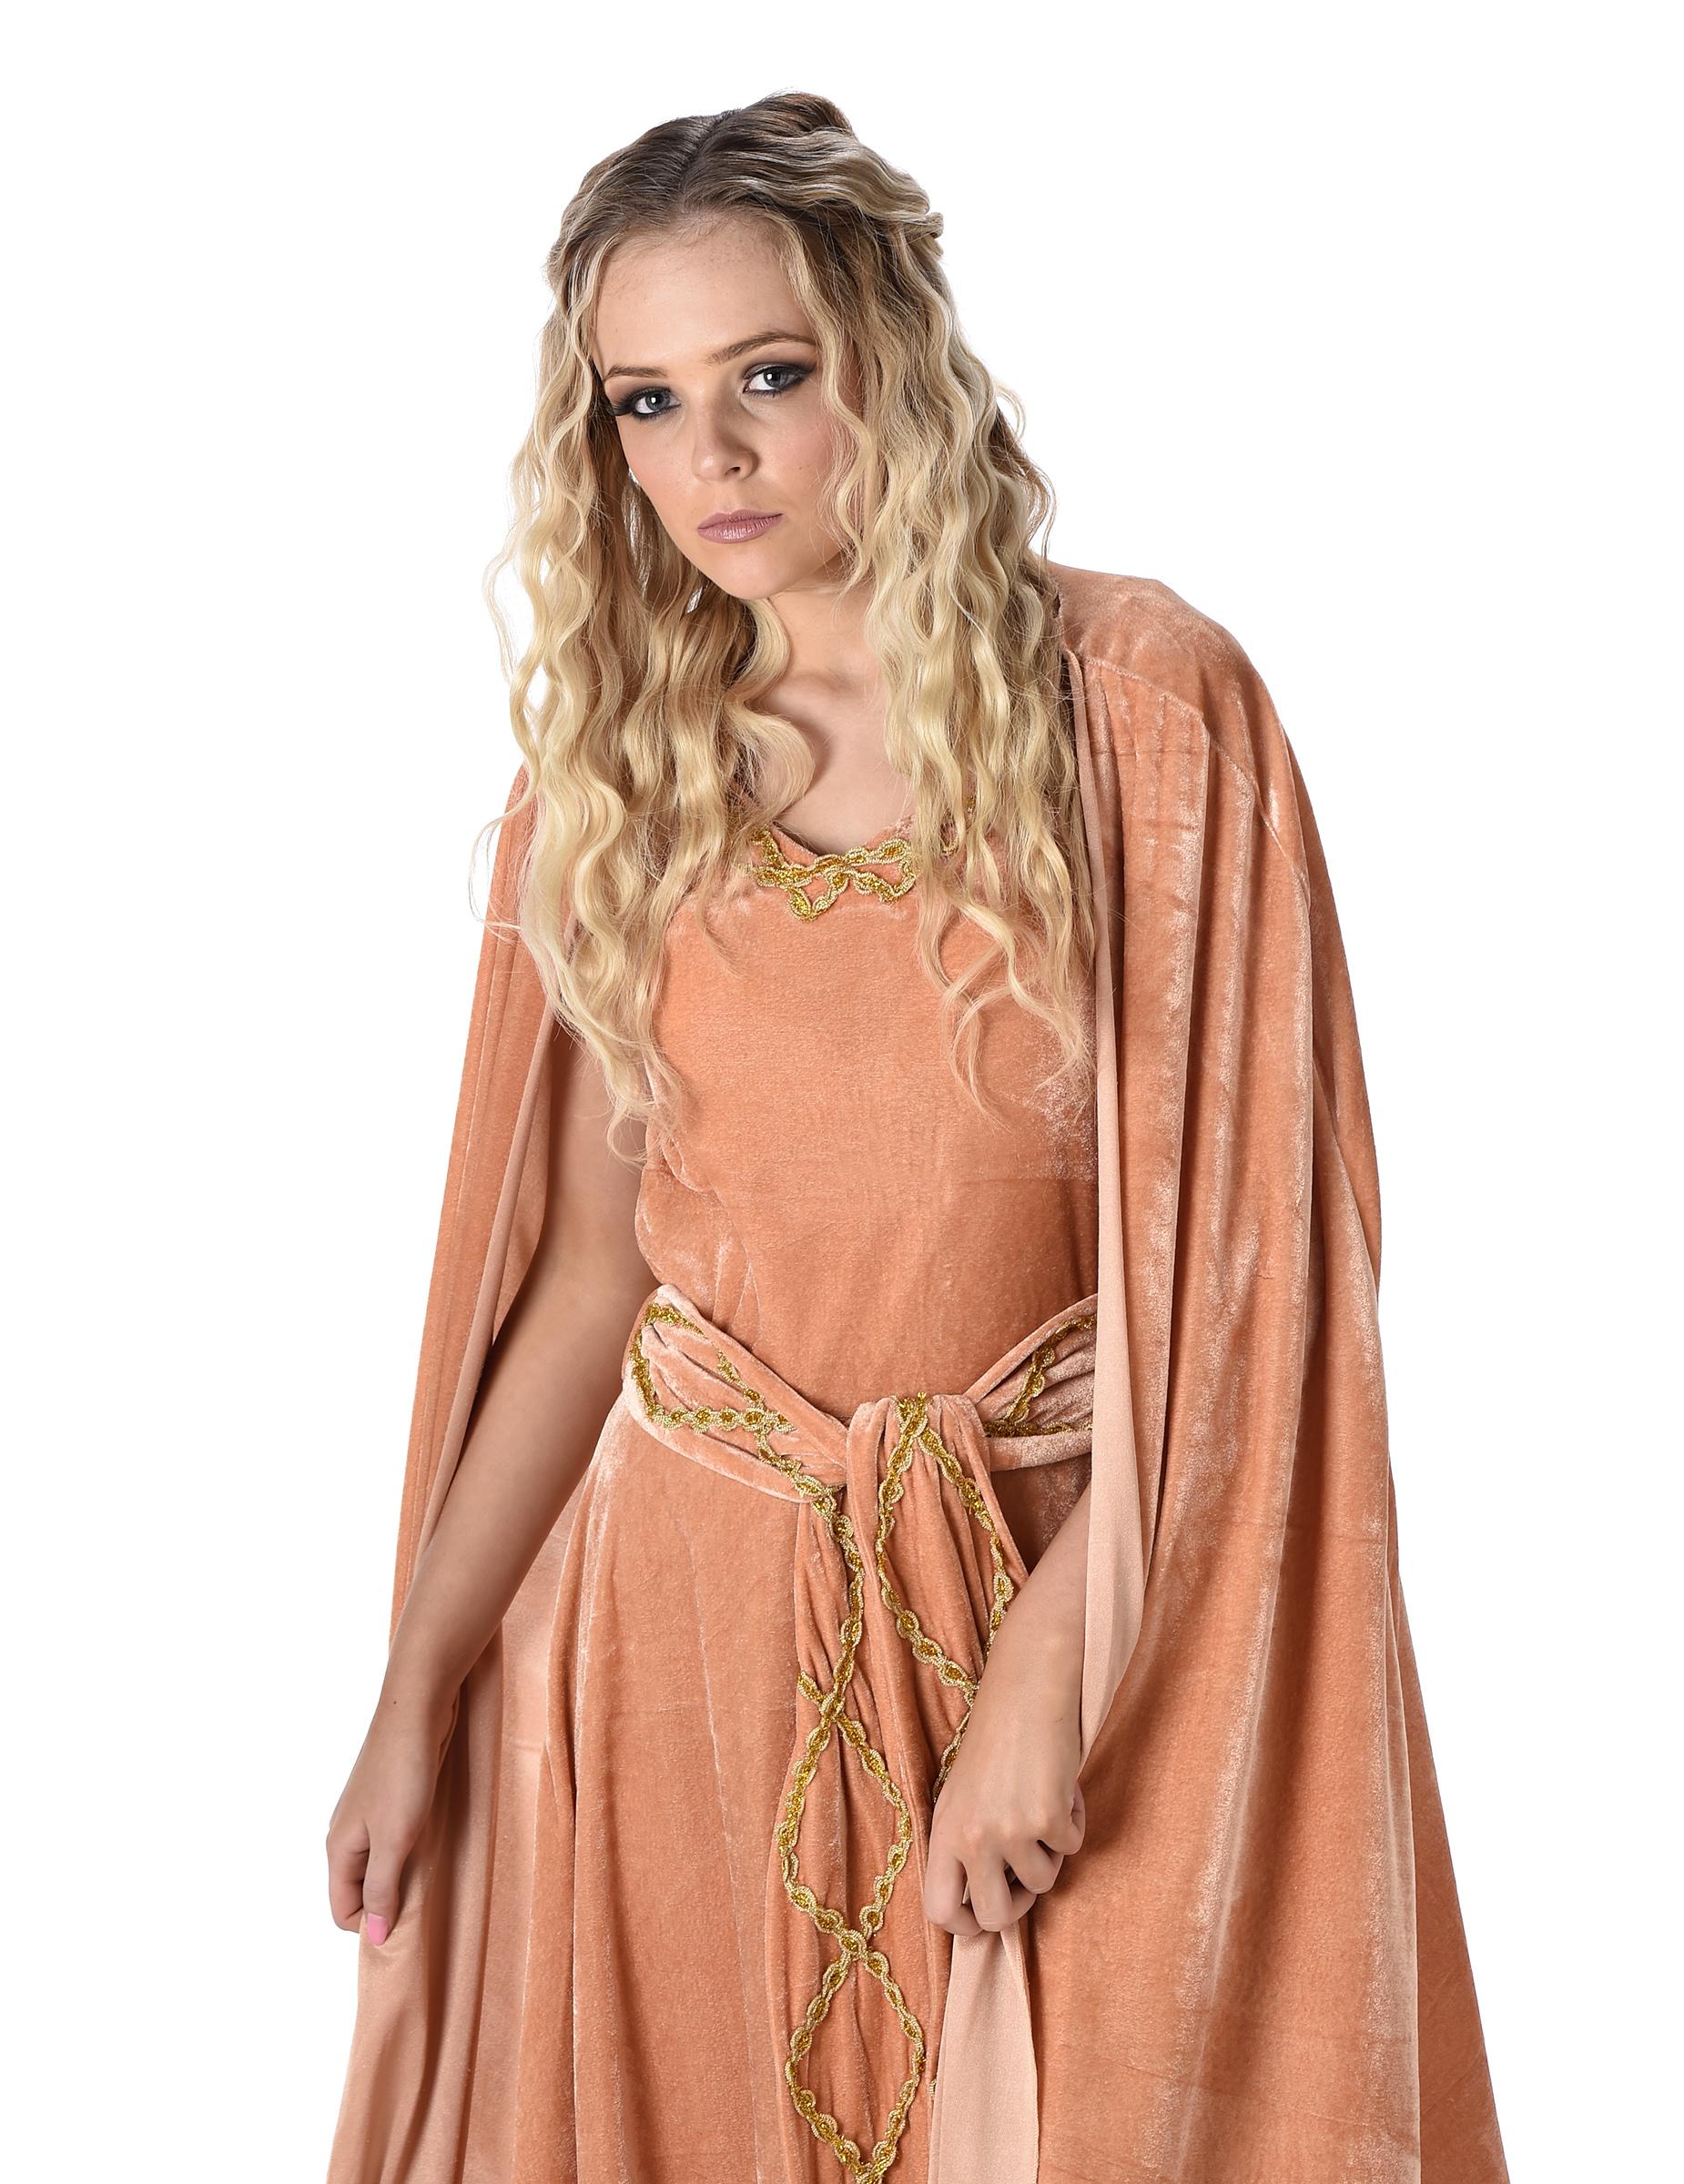 Viking prinsessa 227fbfb294564